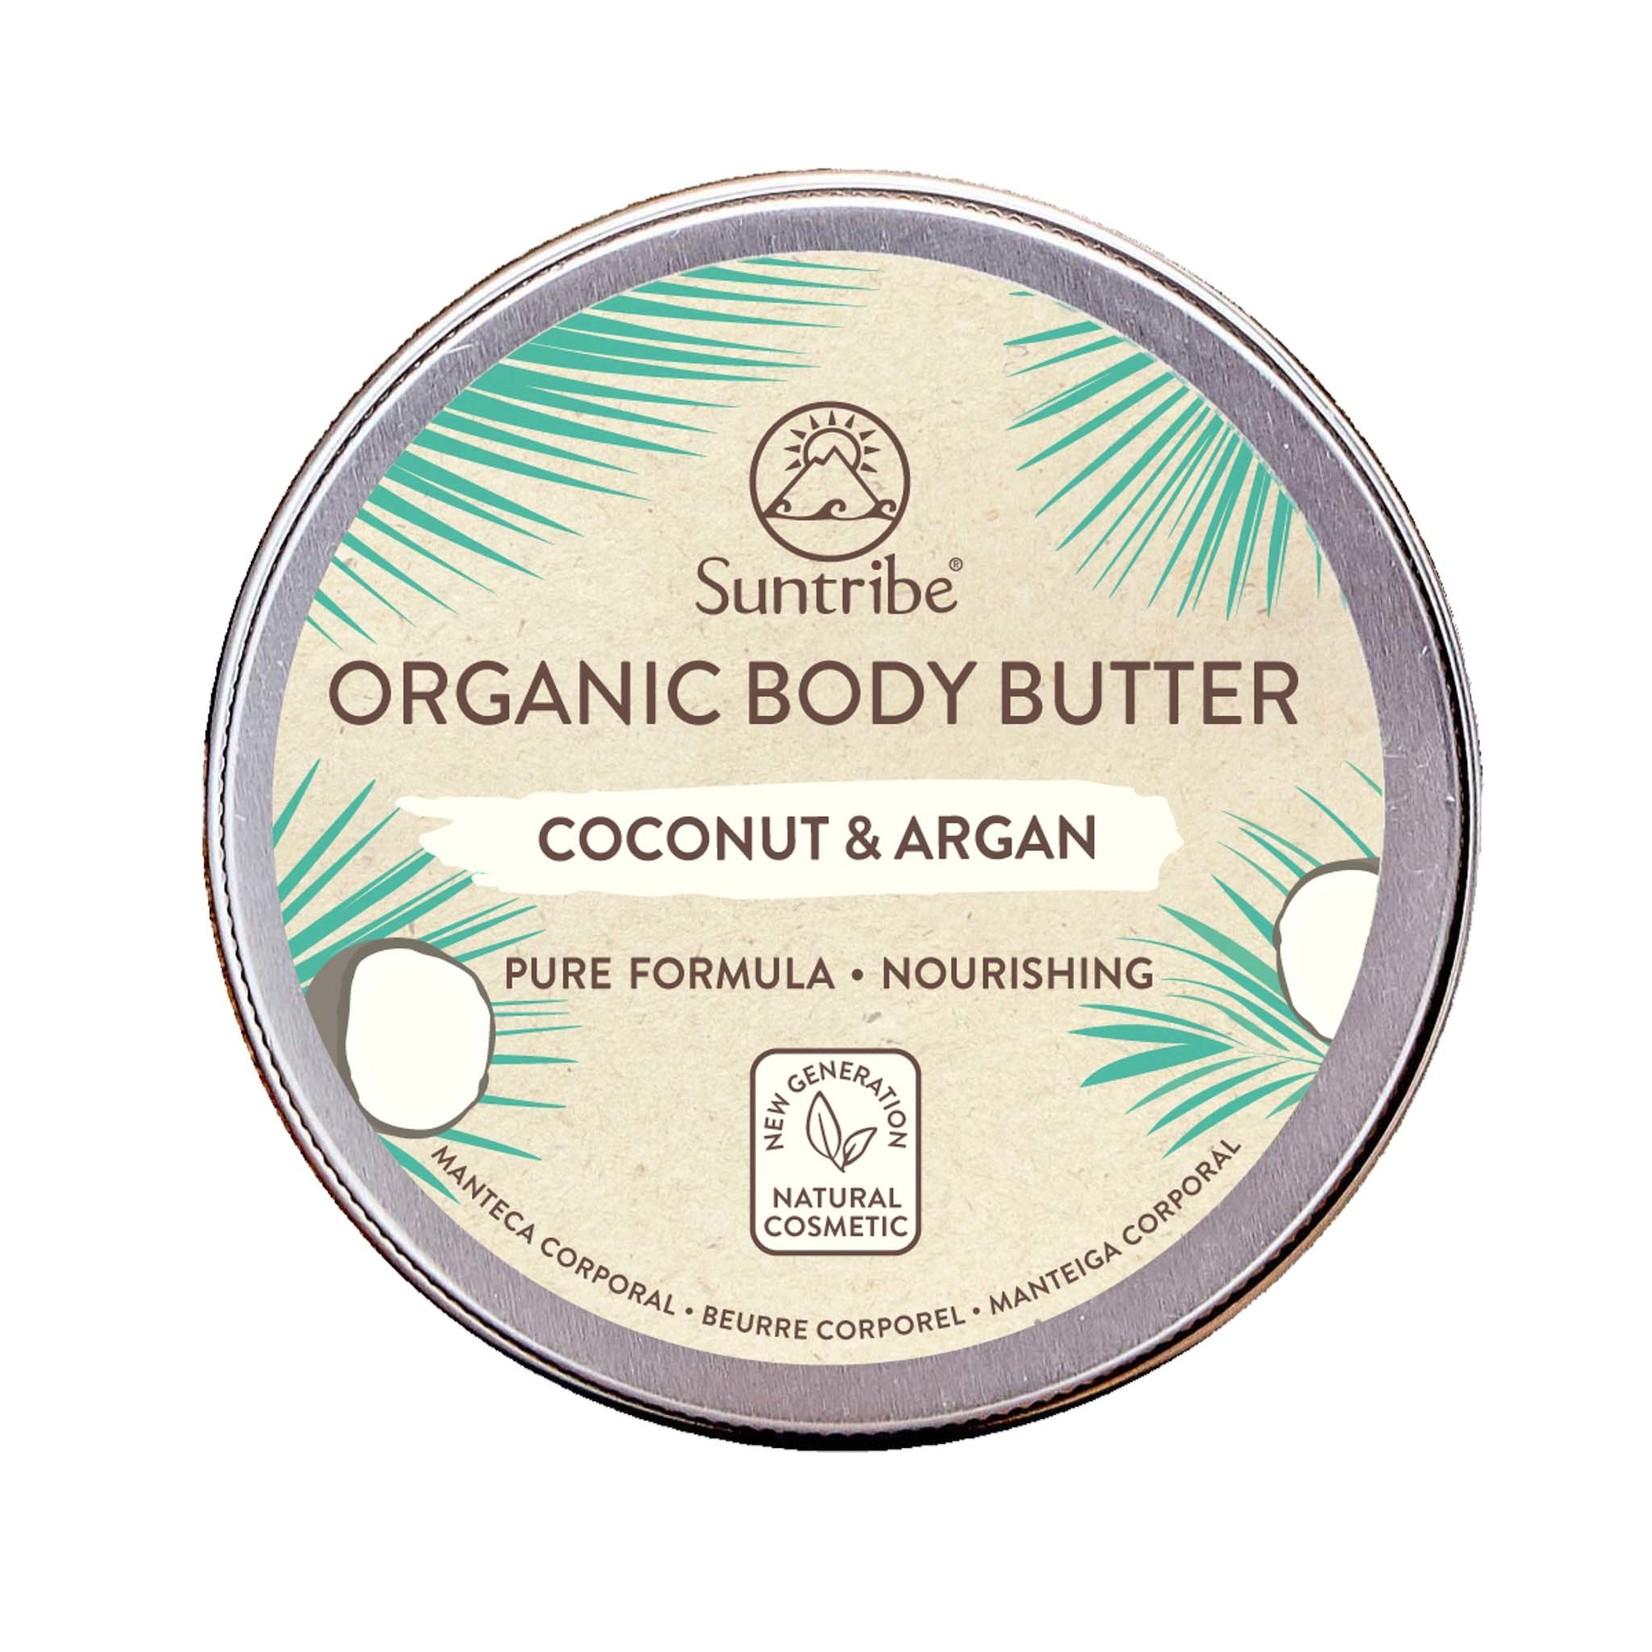 Suntribe Suntribe All Natural Body Butter - Coconut & Argan- 150ml